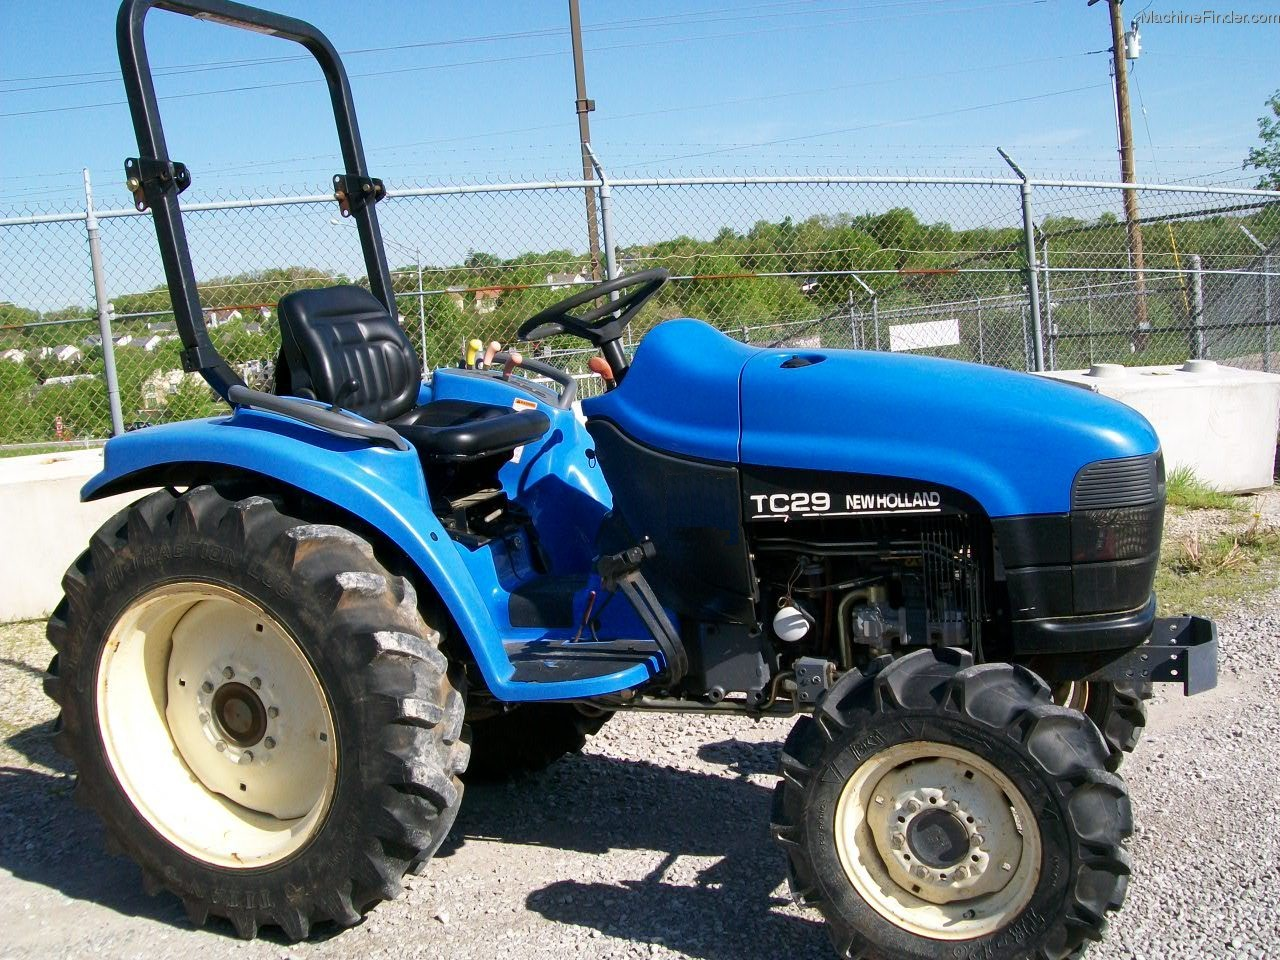 New Holland Tc29 Farm Tractor   New Holland Farm Tractors: New ... on